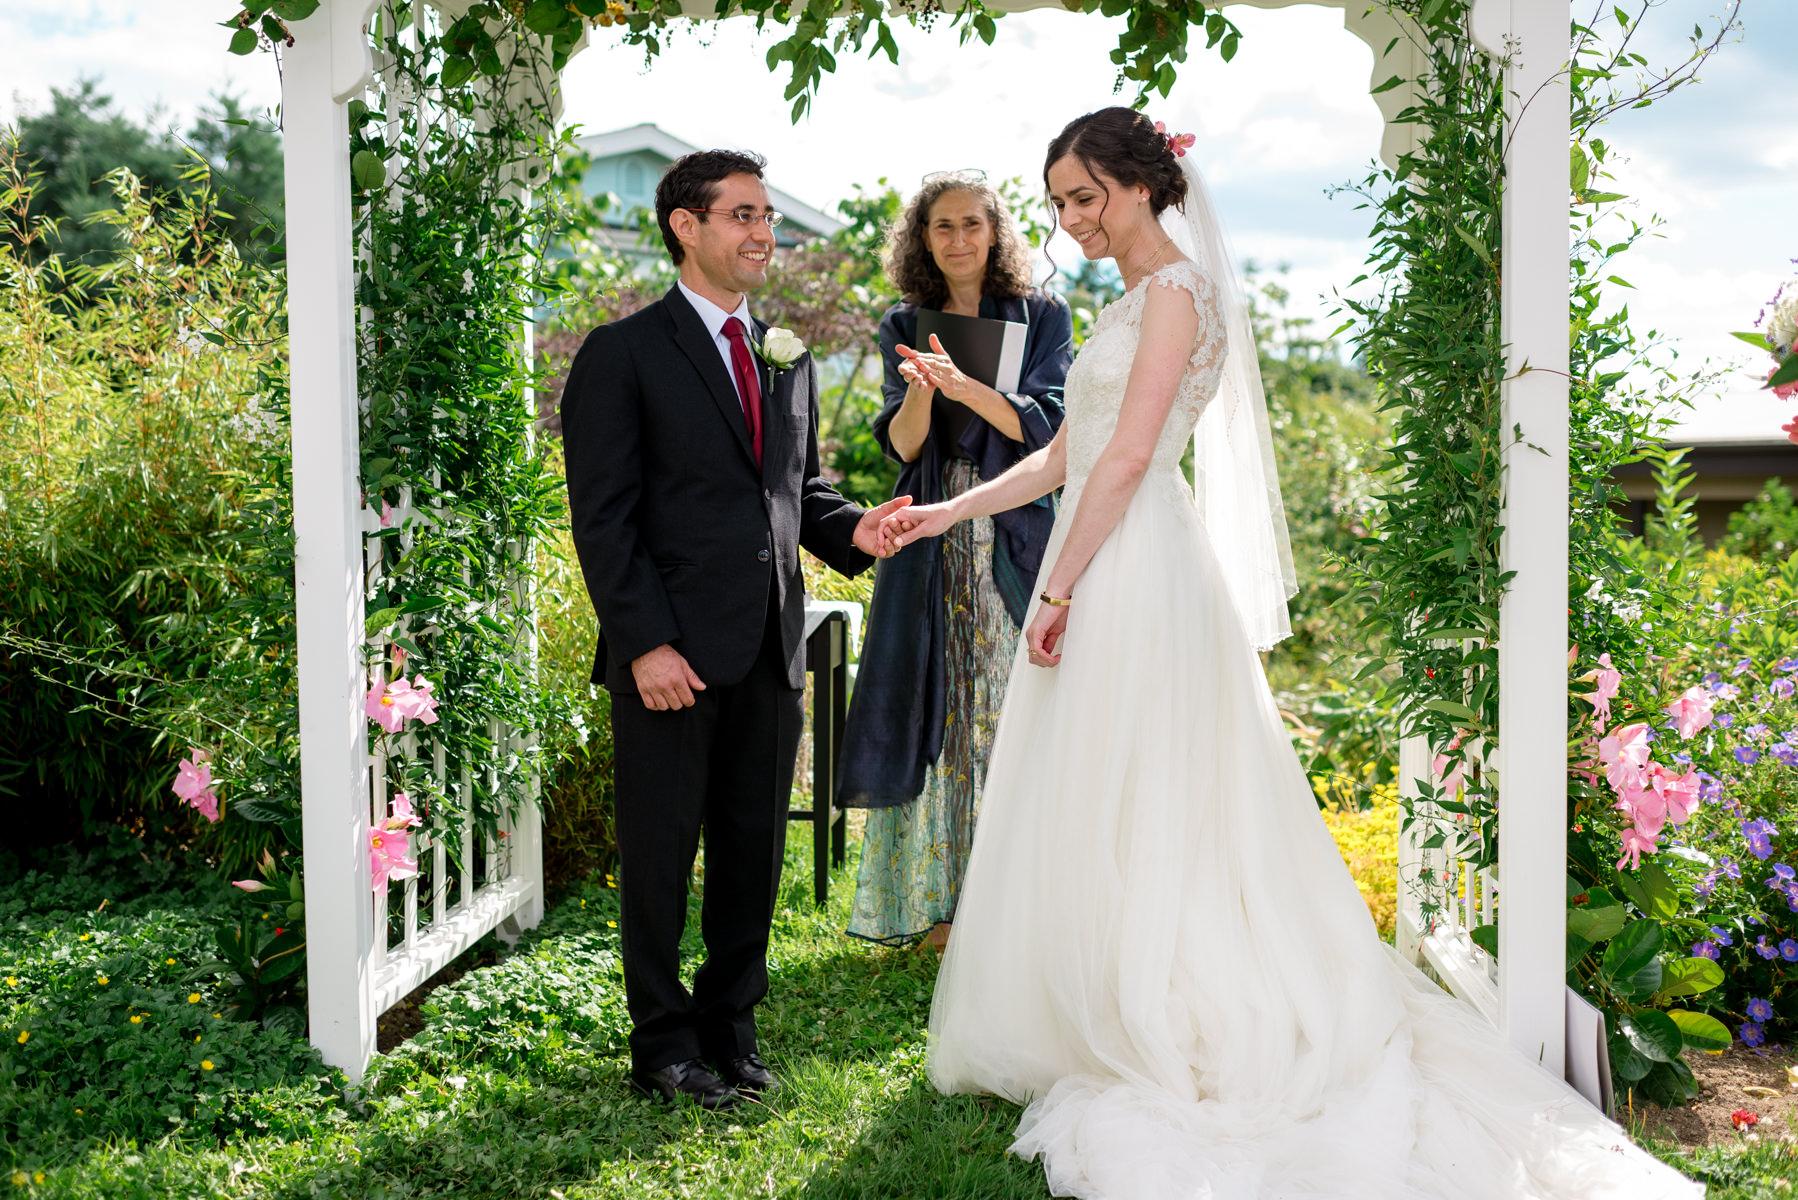 Andrew Tat - Documentary Wedding Photography - Kirkland, Washington - Emily & Cuauh - 17.JPG